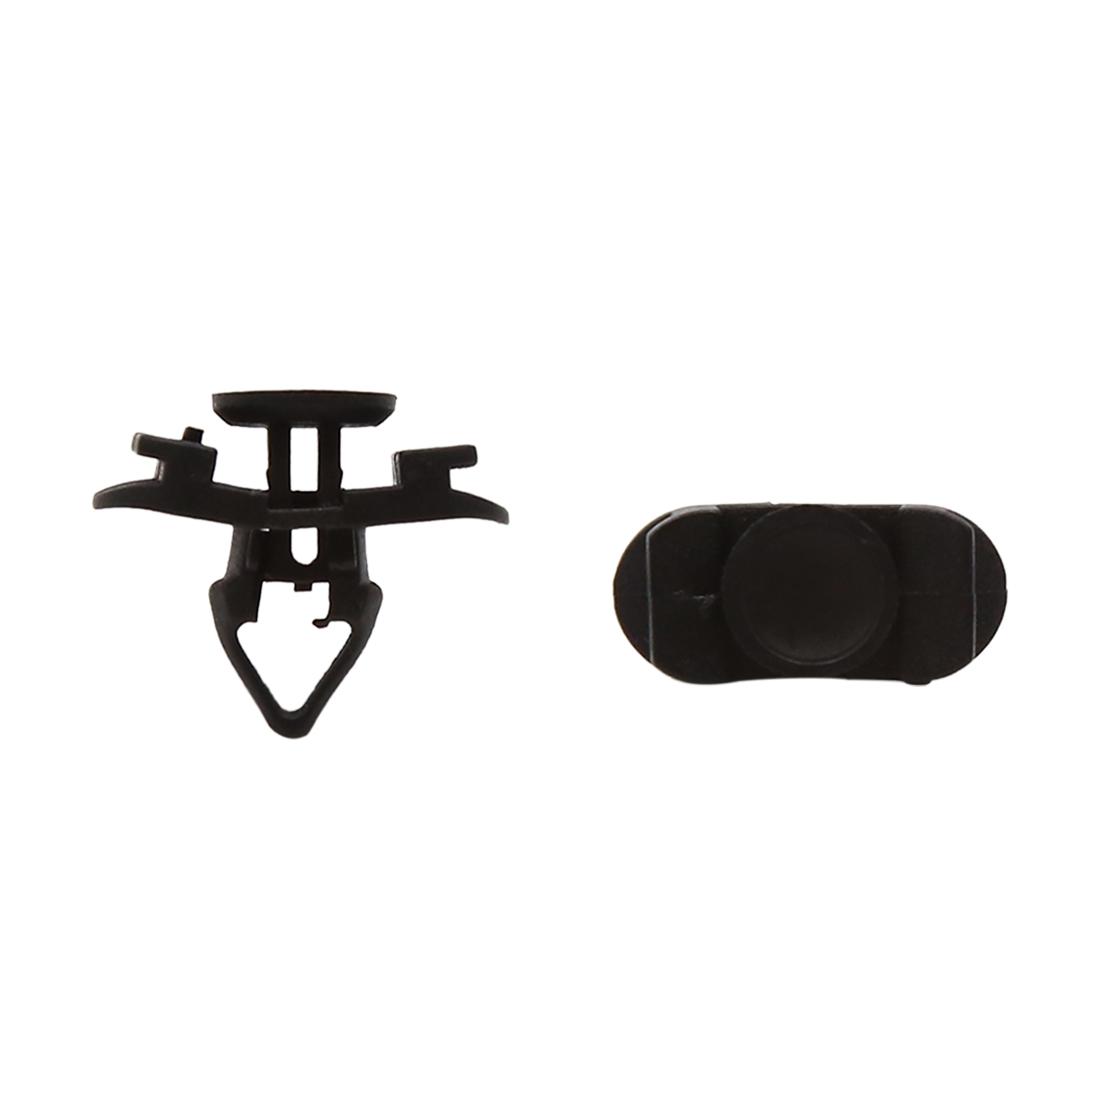 50pcs Black 8mm Hole Dia Plastic Rivets Fastener Retainer Push Type Clips